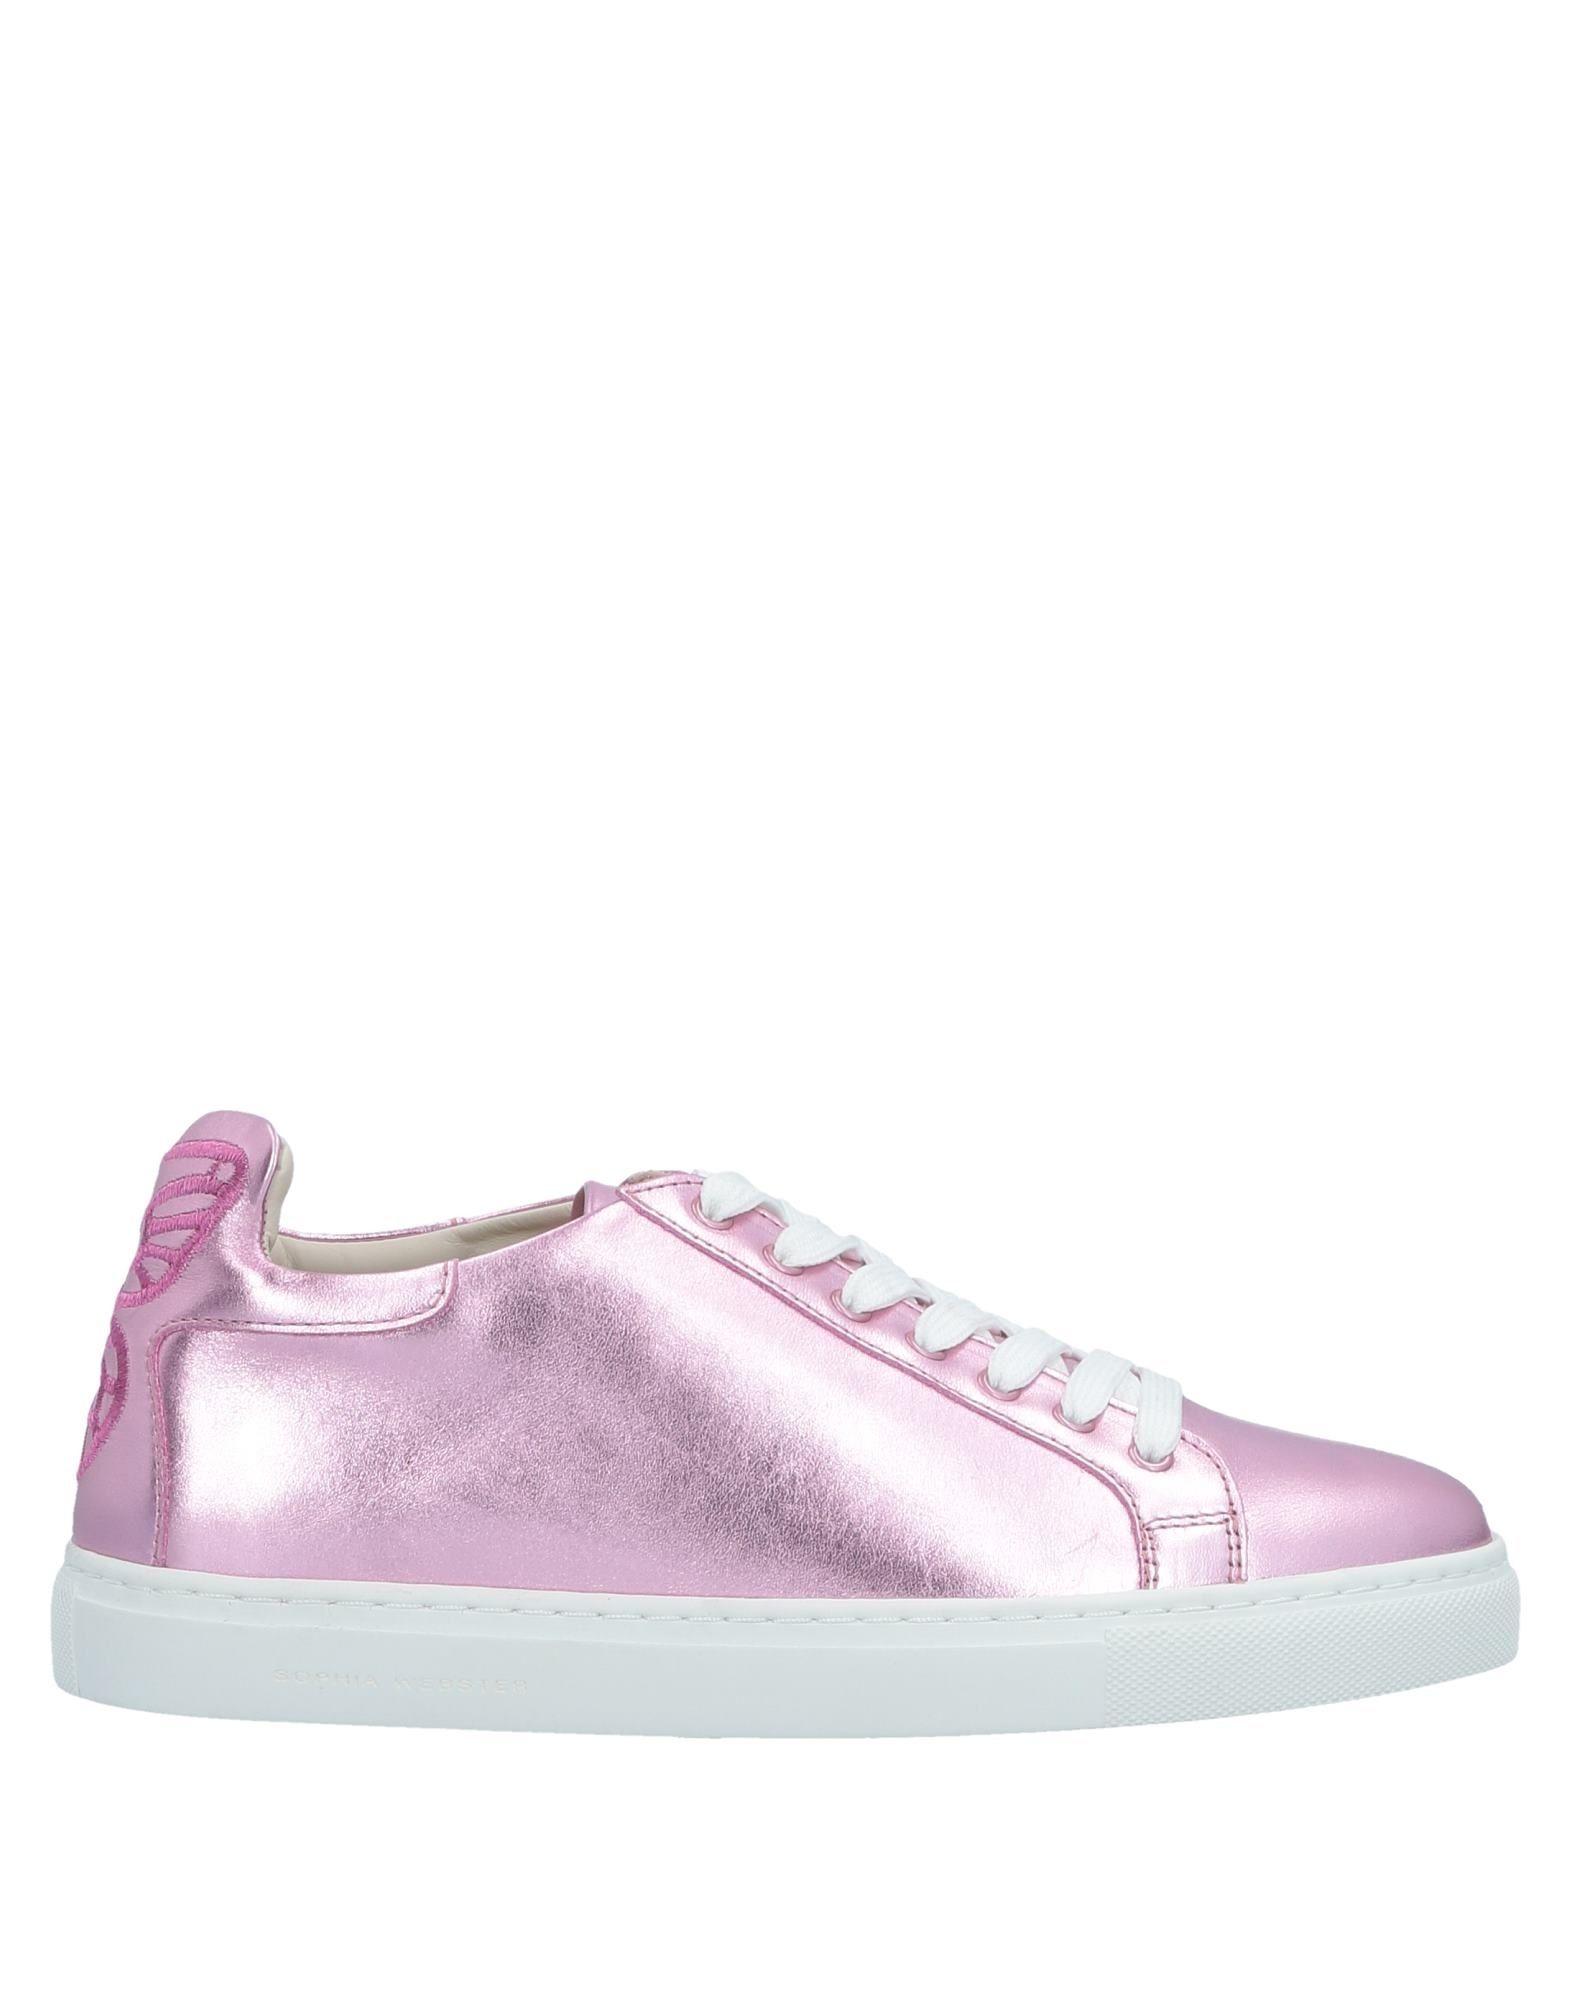 Sneakers Sophia Webster Donna - 11525449AG